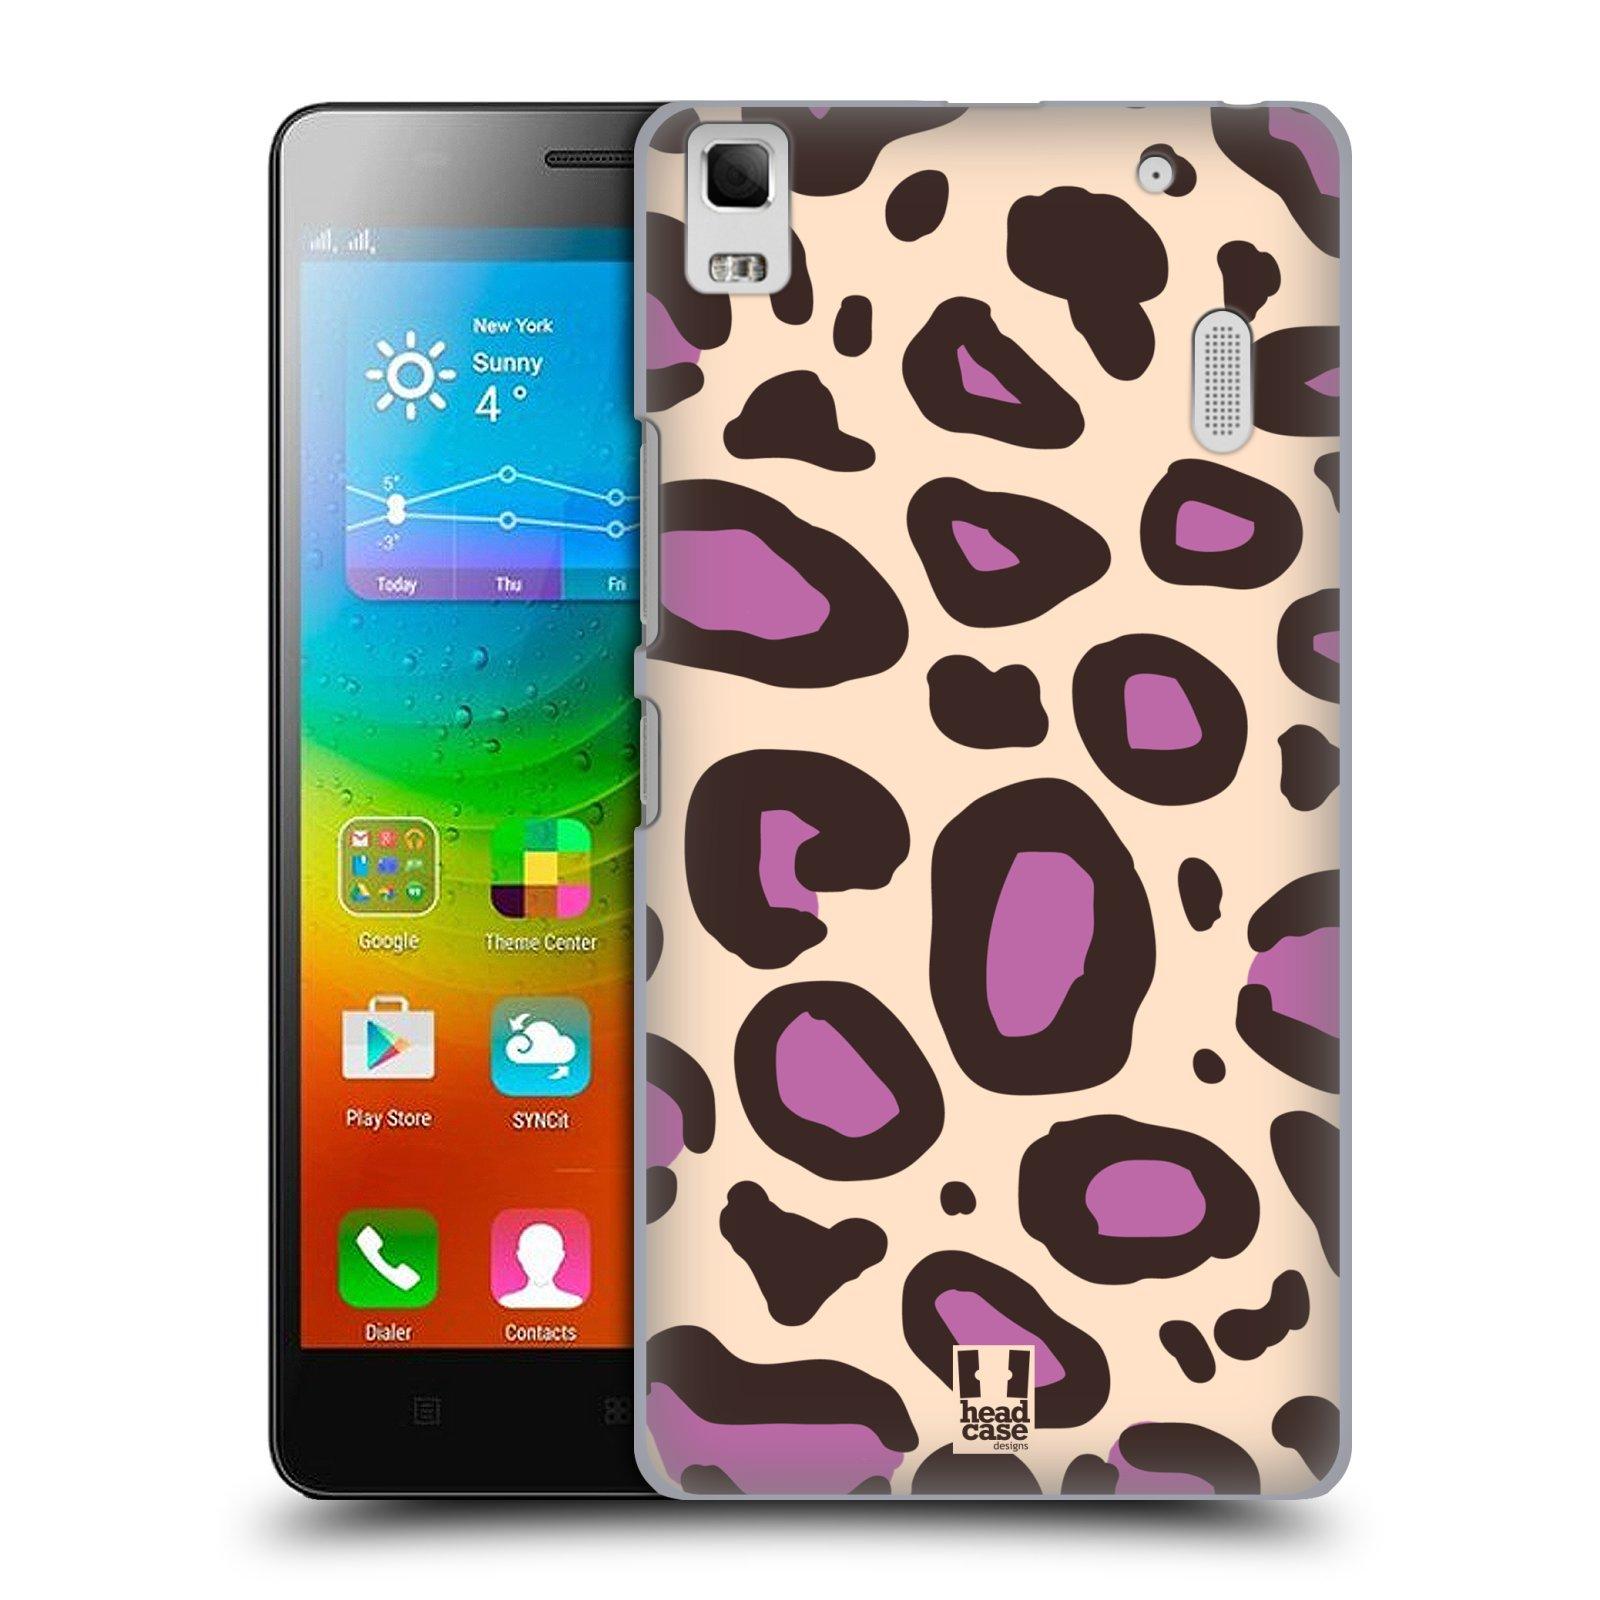 HEAD CASE pevný plastový obal na mobil LENOVO A7000 / A7000 DUAL / K3 NOTE vzor Divočina zvíře 2 neutrální fialová